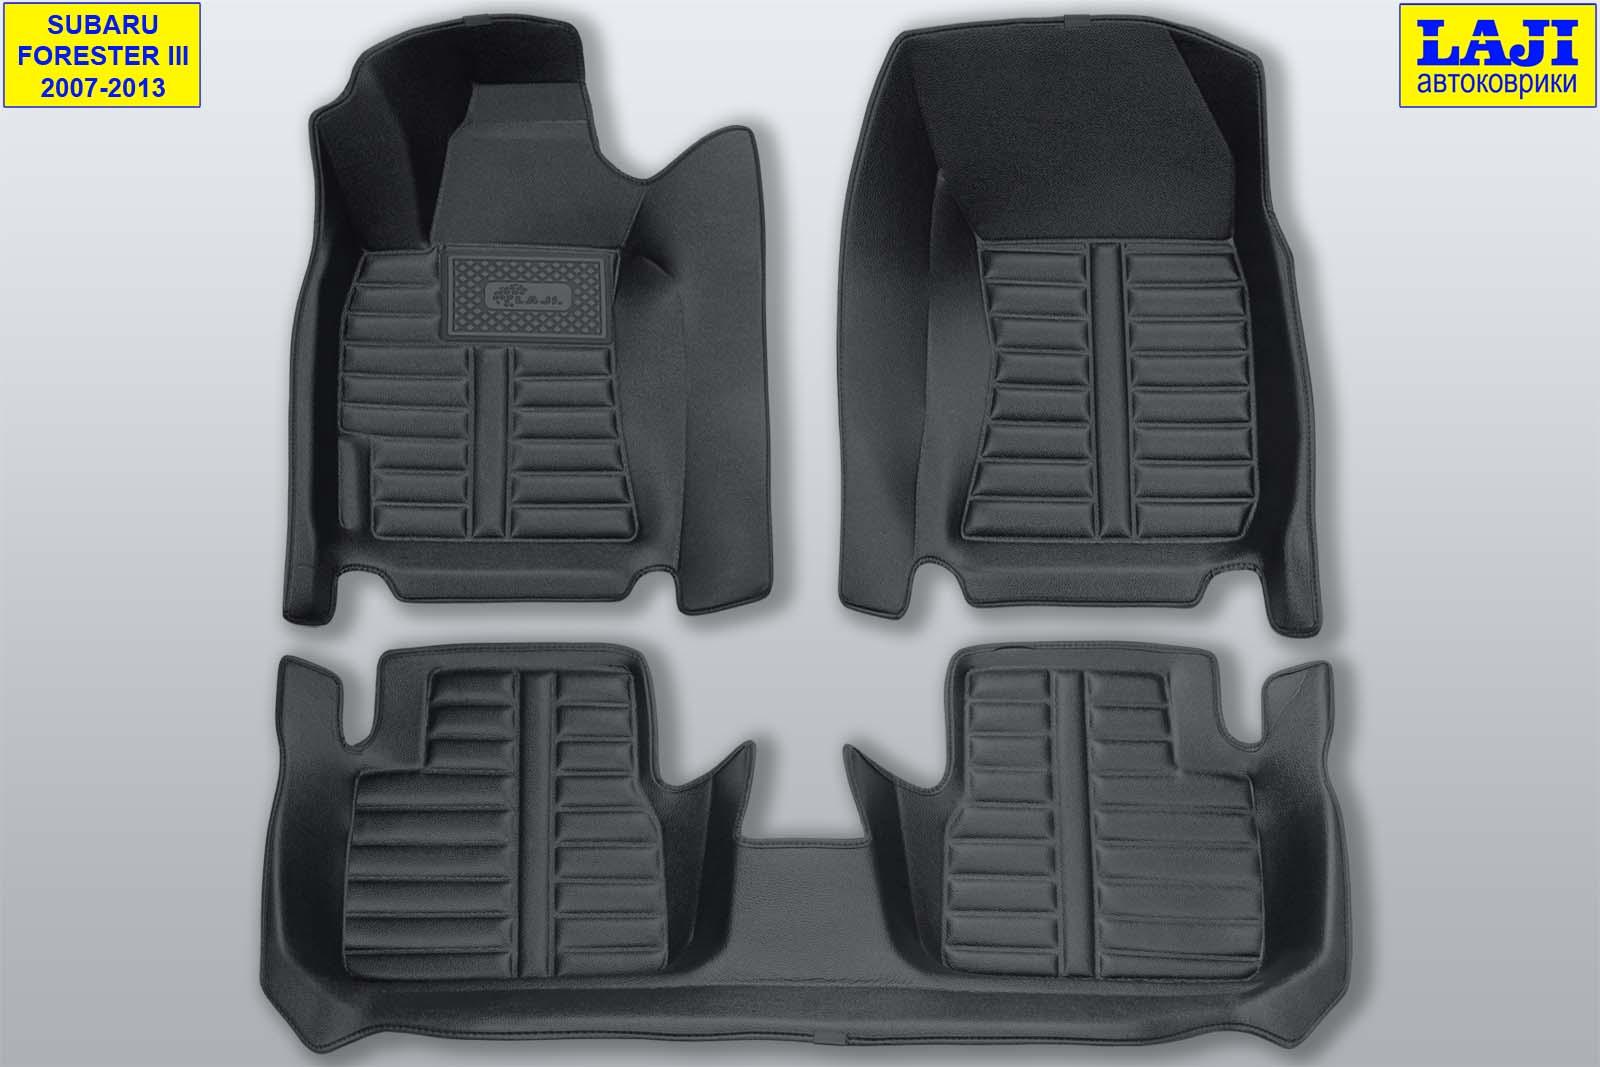 5D коврики в салон Subaru Forester III 2007-2013 1